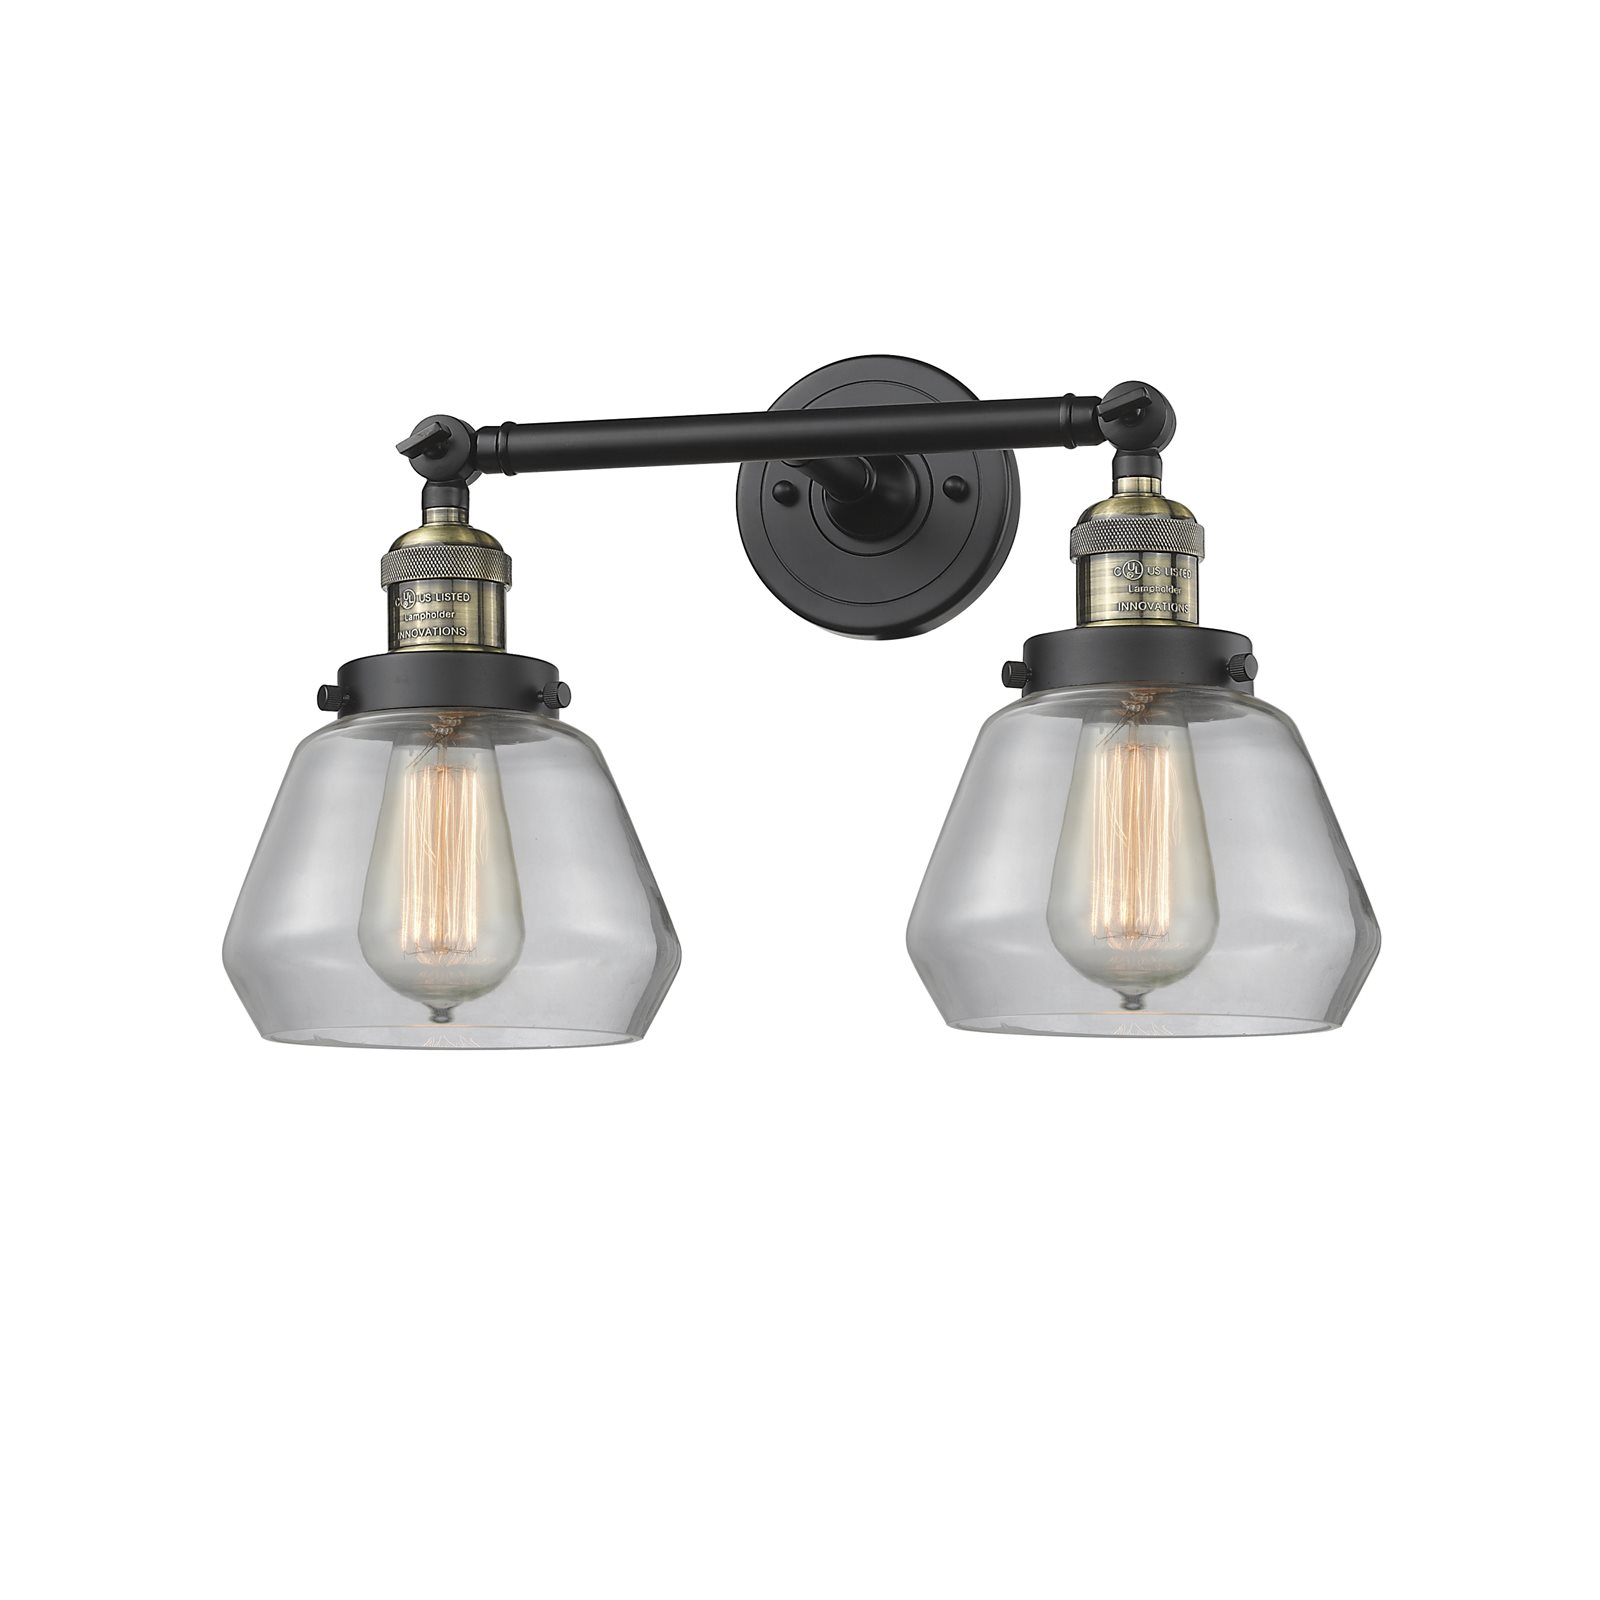 "Innovations 2-LT LED Fulton 16.5"" Bathroom Fixture Black Brushed Brass 208-BBB-G172-LED by"